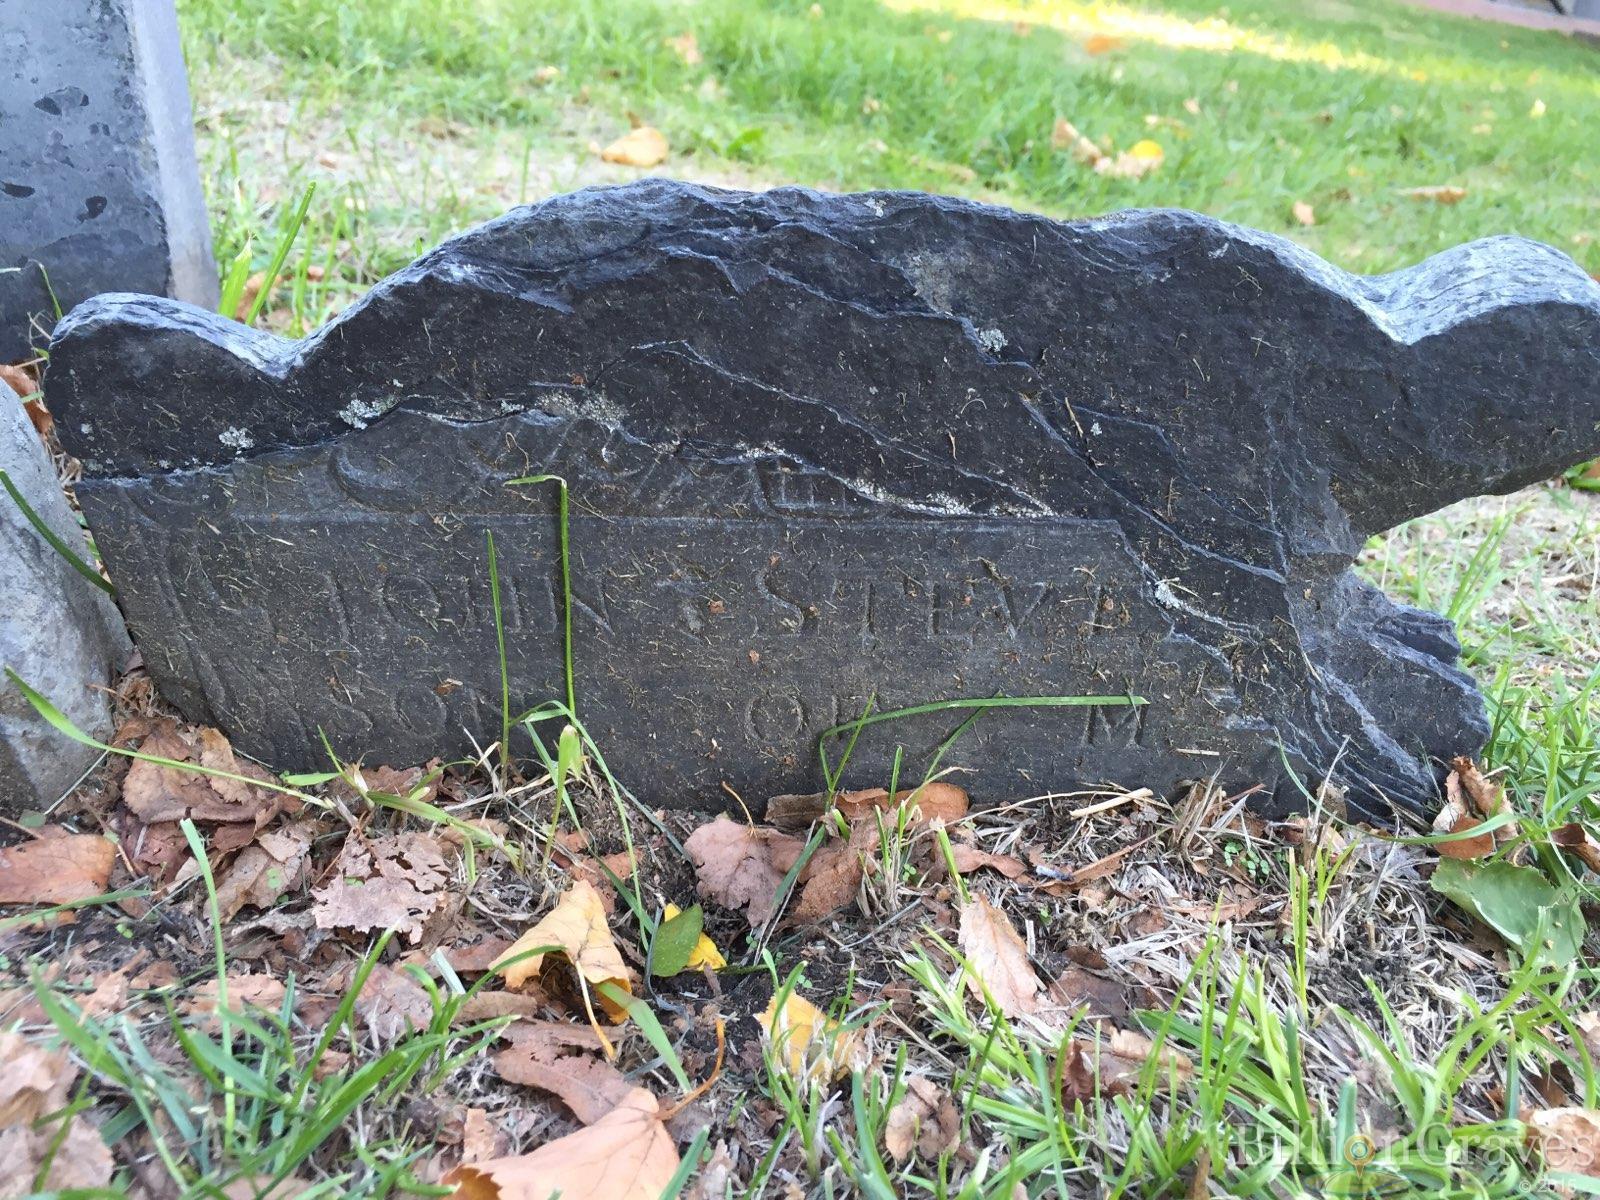 shale, slate, BillionGraves, gravestone, grave, damaged gravestones, cemetery, family history, ancestors, community service project, JustServe, BillionGraves app, ivy, plant growth, JustServe